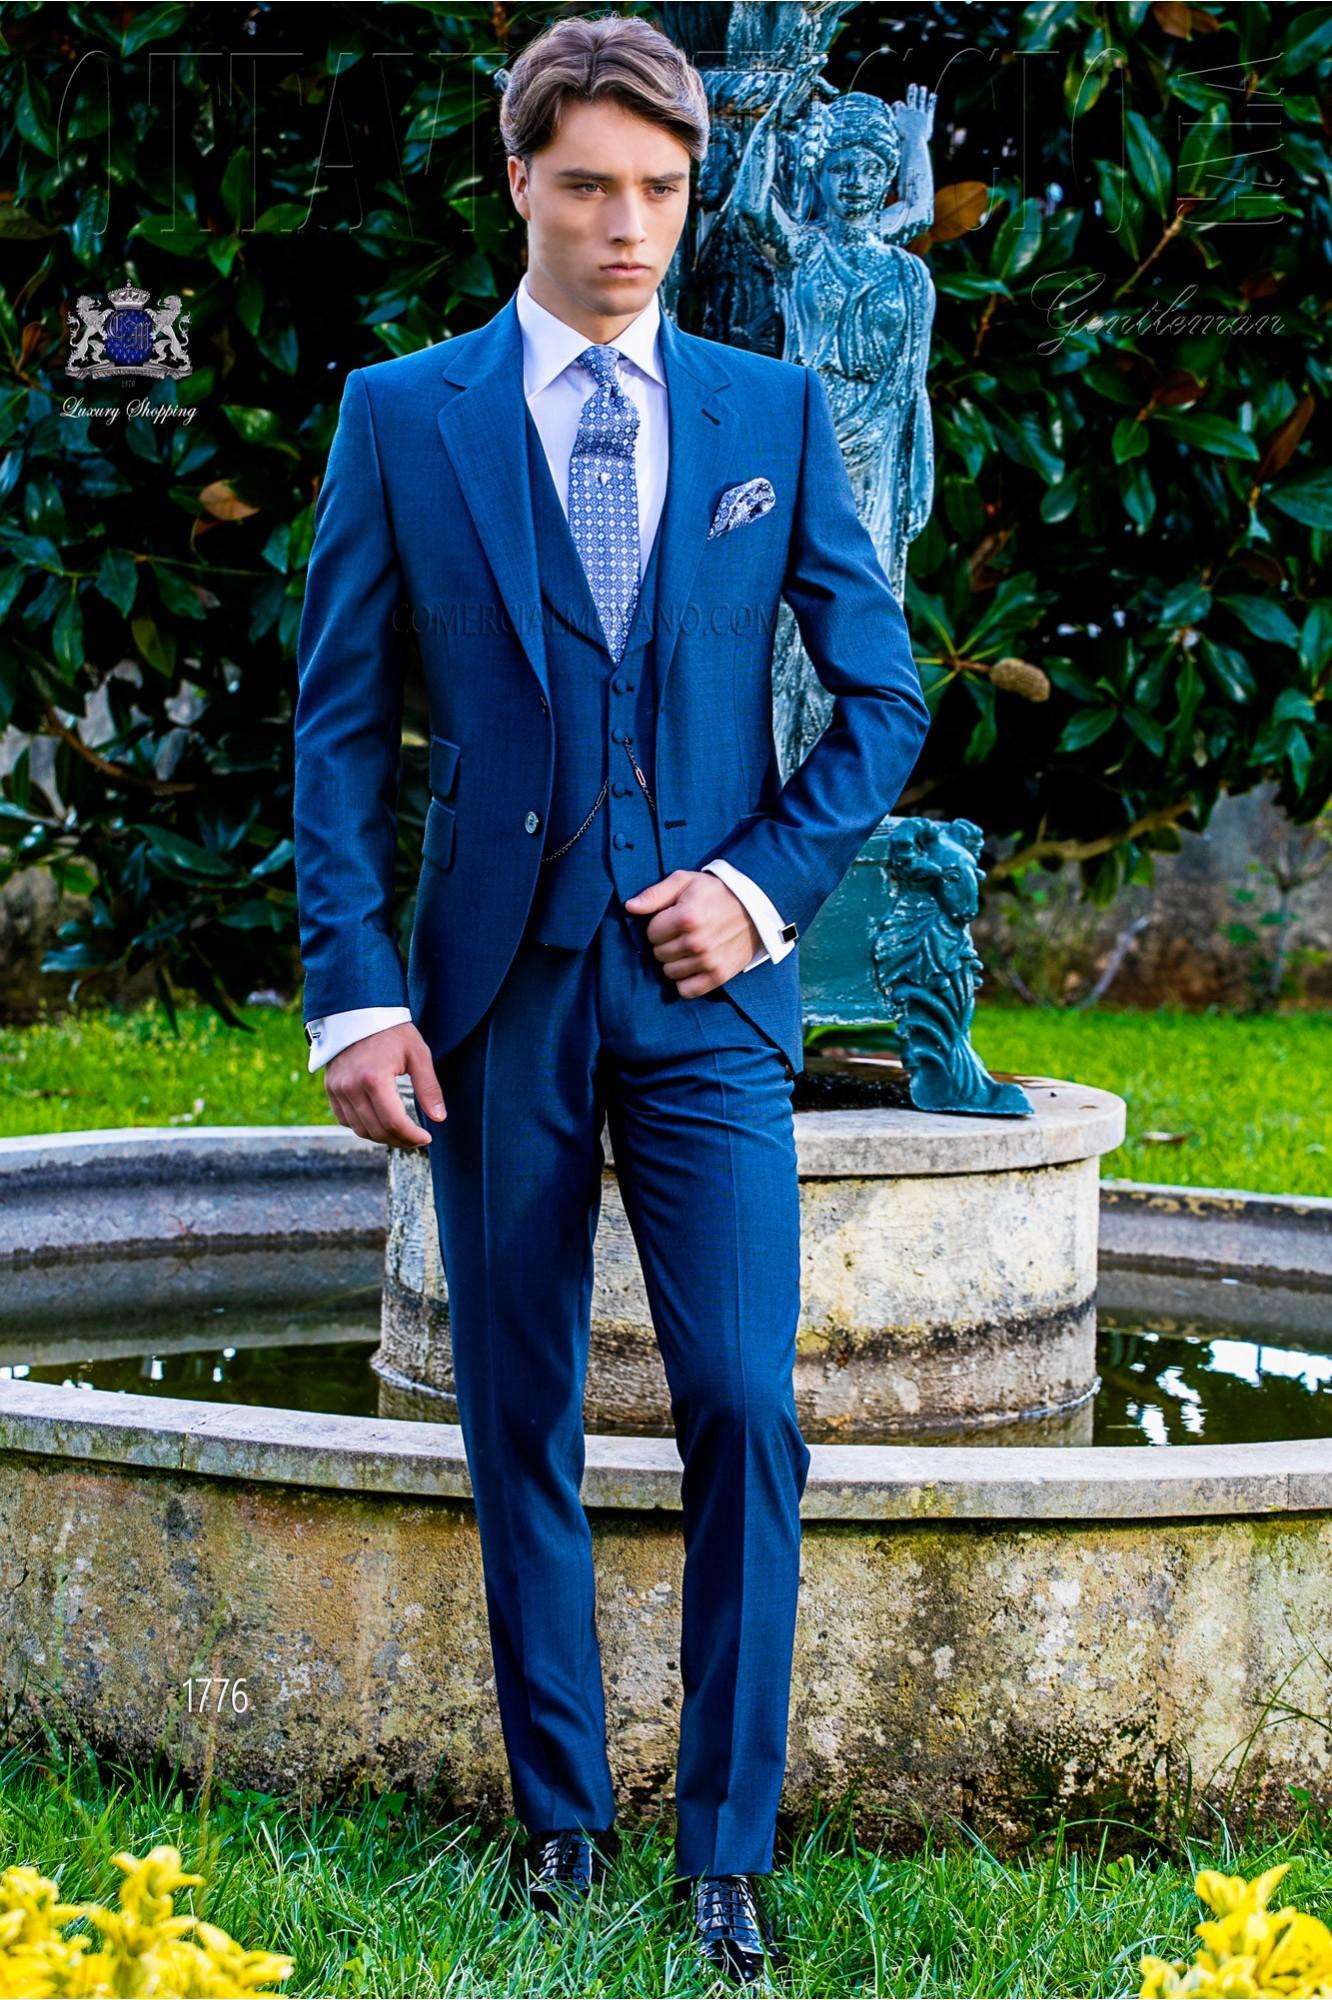 Bespoke royal blue suit mohair wool alpaca model 1776 Ottavio Nuccio Gala